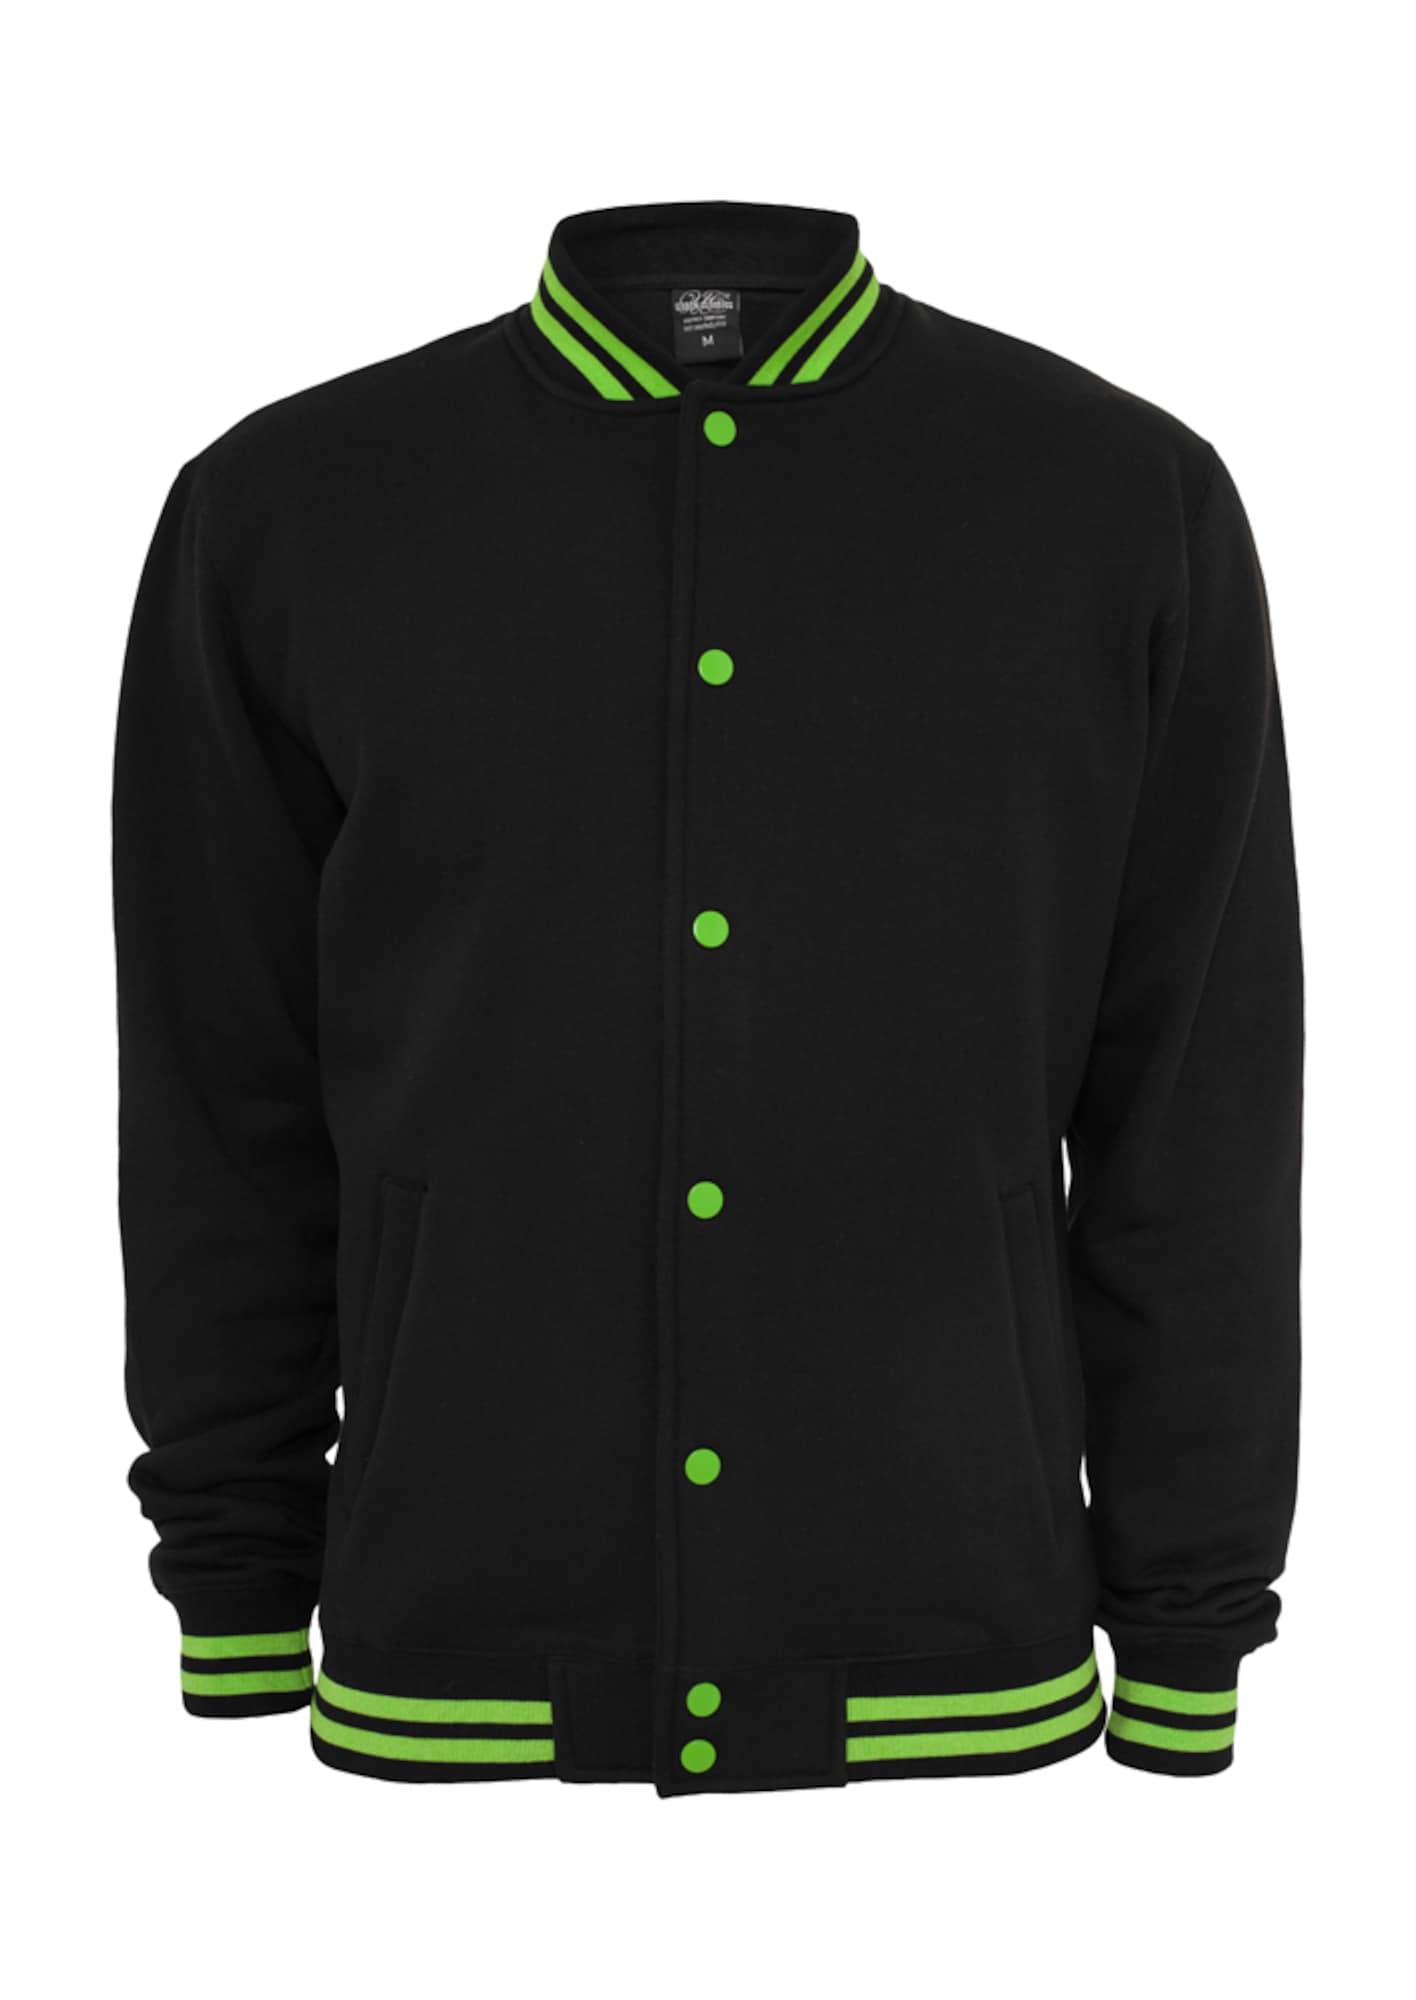 Sweatjacket | Bekleidung > Sweatshirts & -jacken > Sweatjacken | Urban Classics